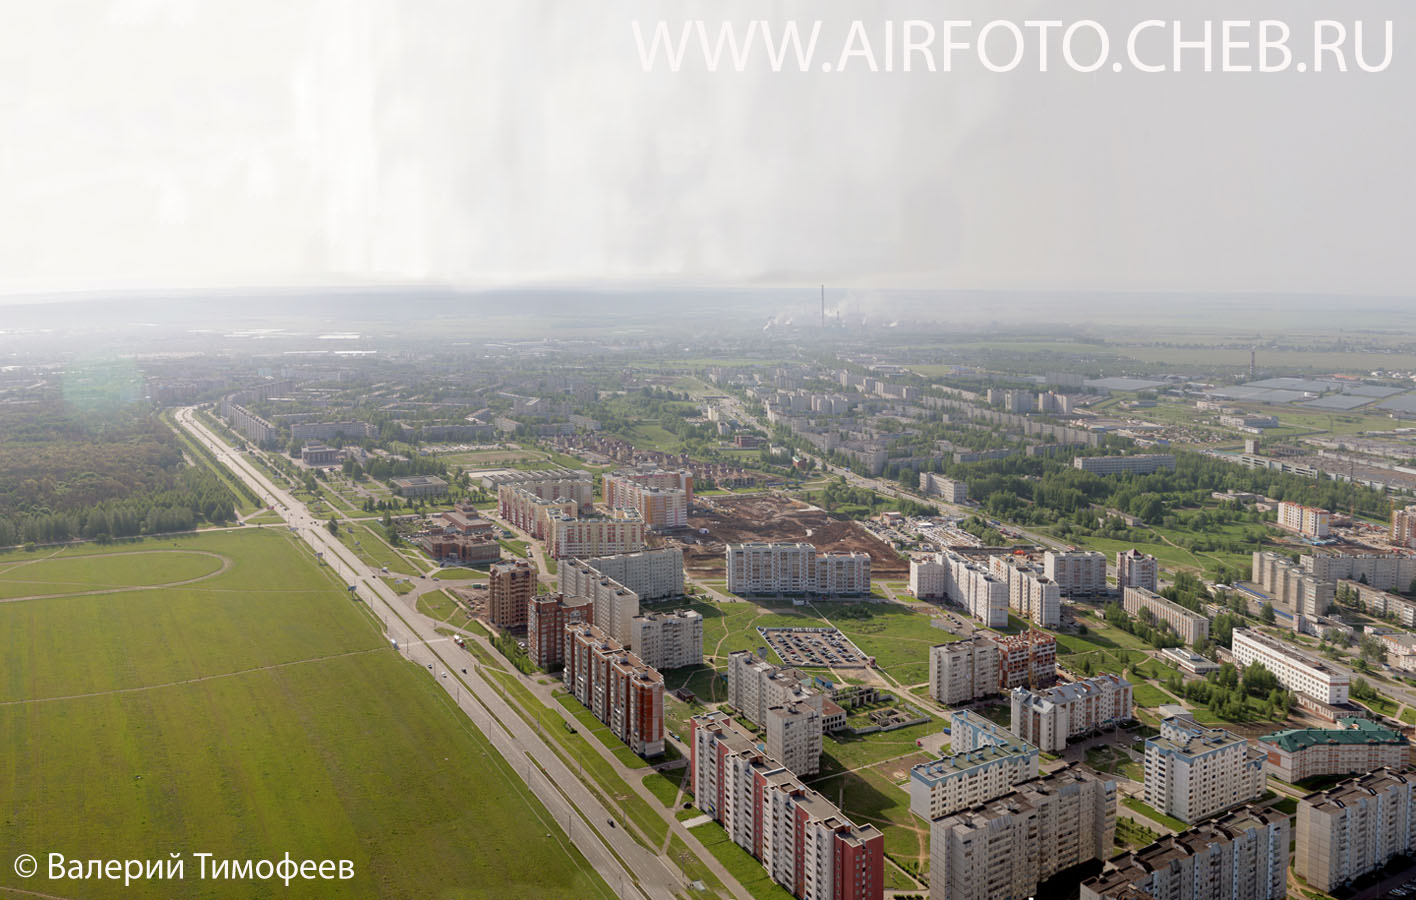 http://www.airfoto.cheb.ru/foto/airfoto.cheb.ru-38231.jpg